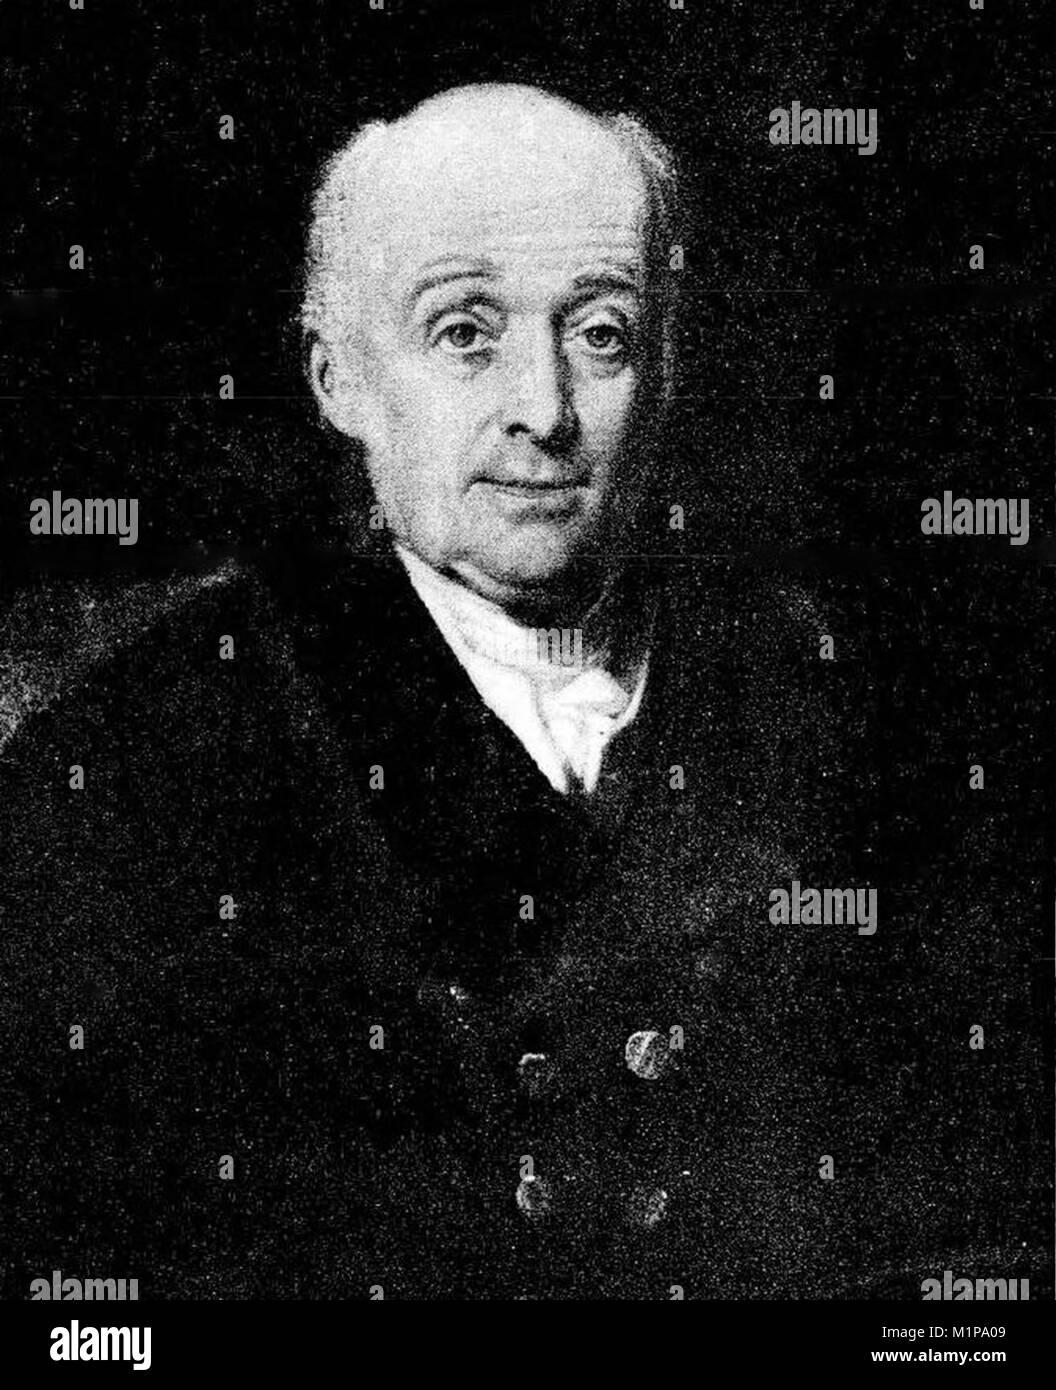 William Lambton, Lieutenant-Colonel William Lambton, (1753 – 1823) British soldier, surveyor, and geographer who - Stock Image